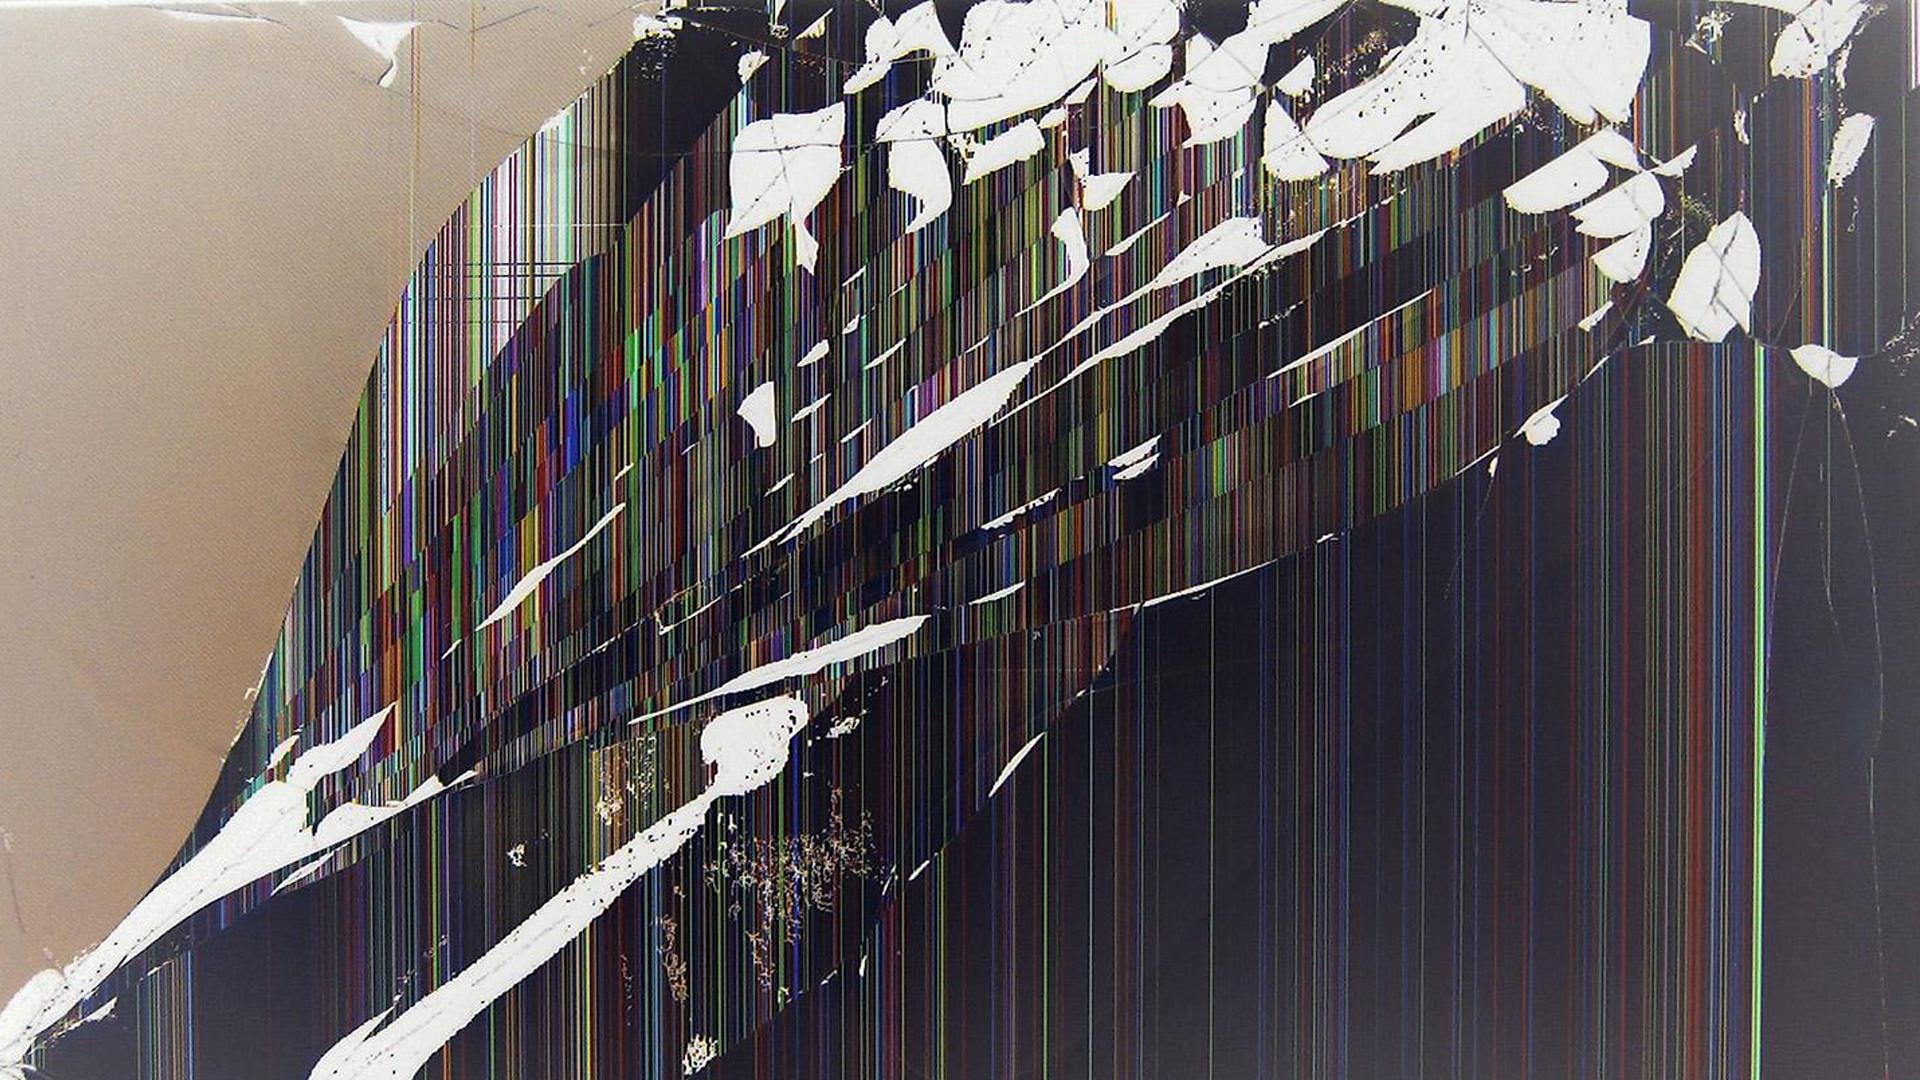 broken screen wallpaper prank for iphone ipod windows and mac laptop